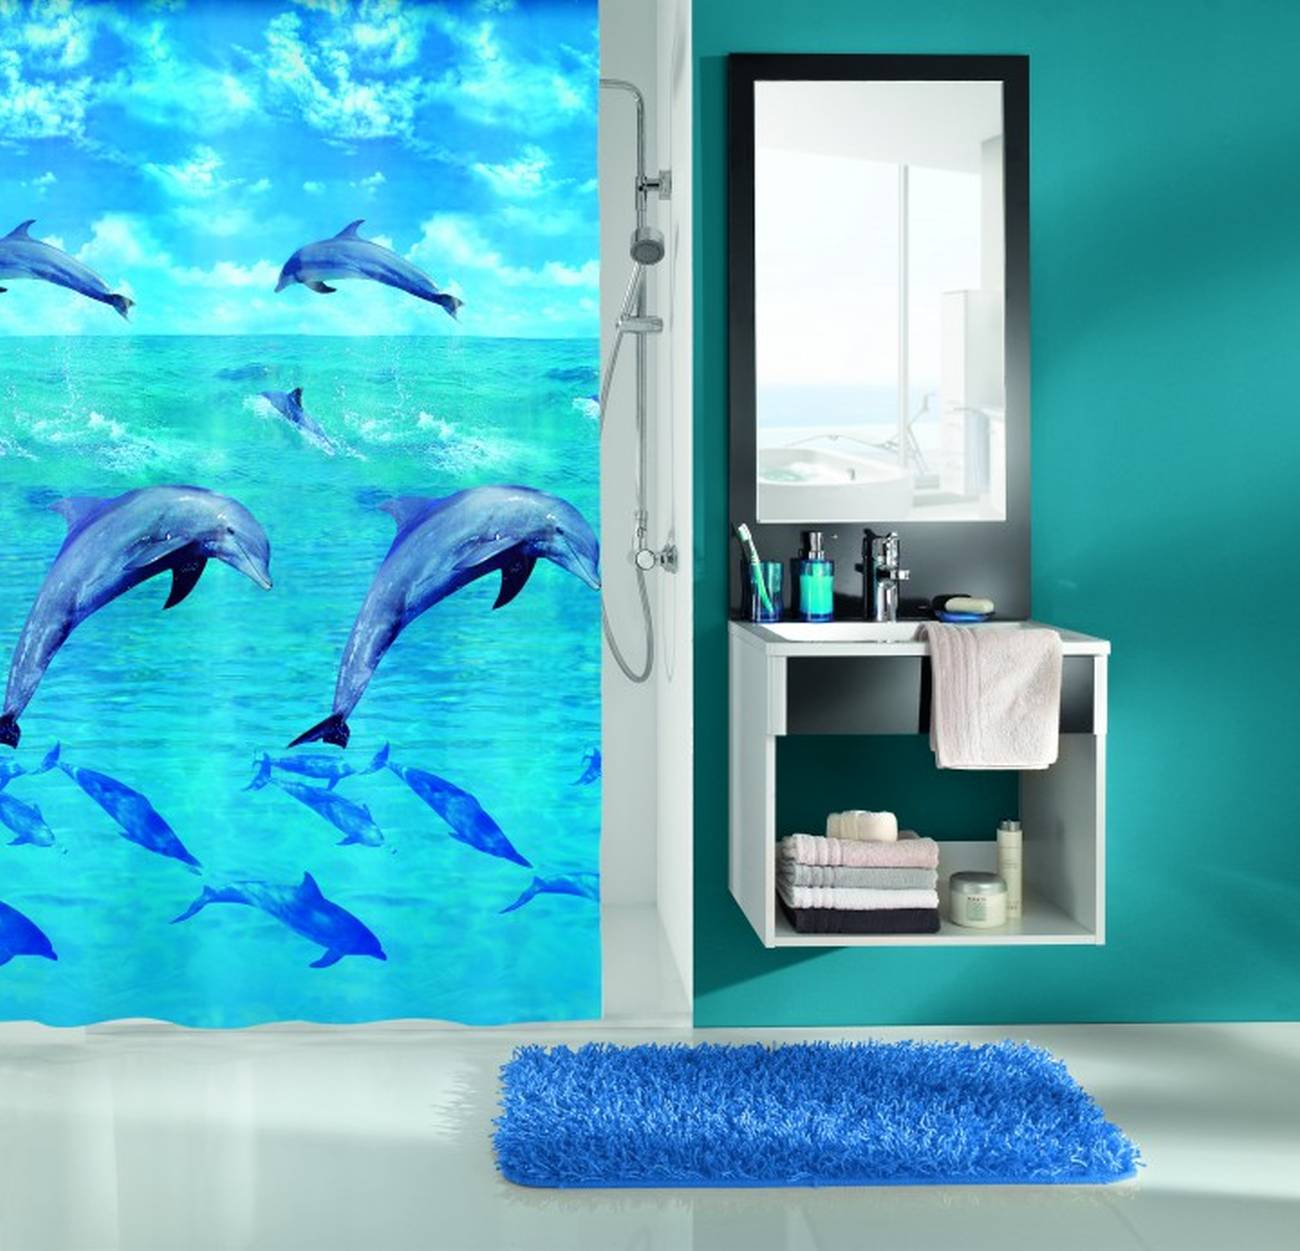 Duschvorhang Dolphin PEVA Multicolor 180x200 cm